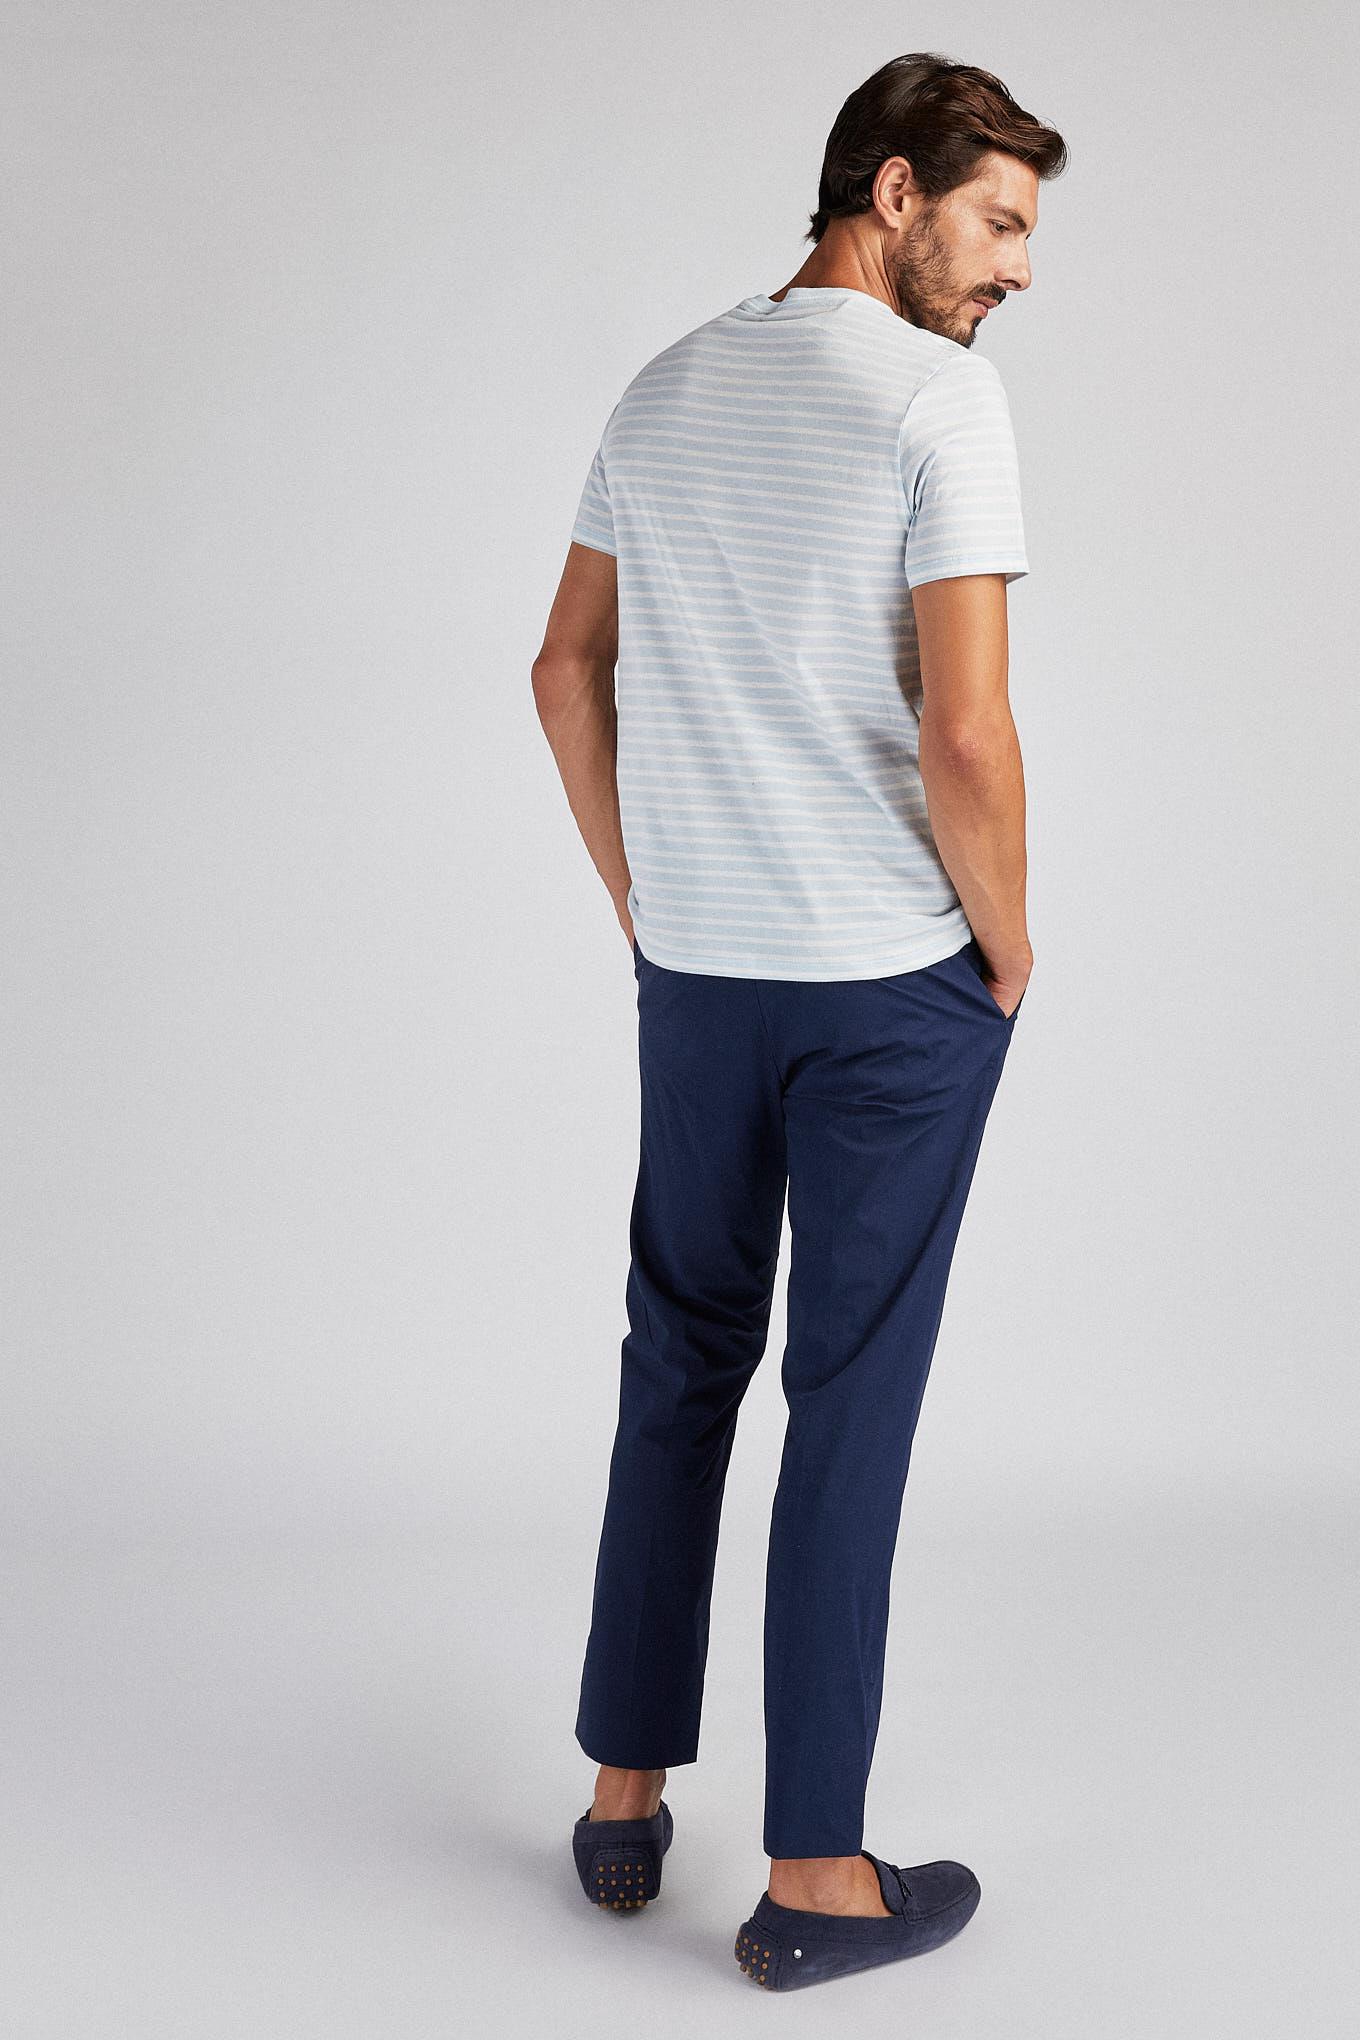 T-Shirt Azul Claro Sport Homem